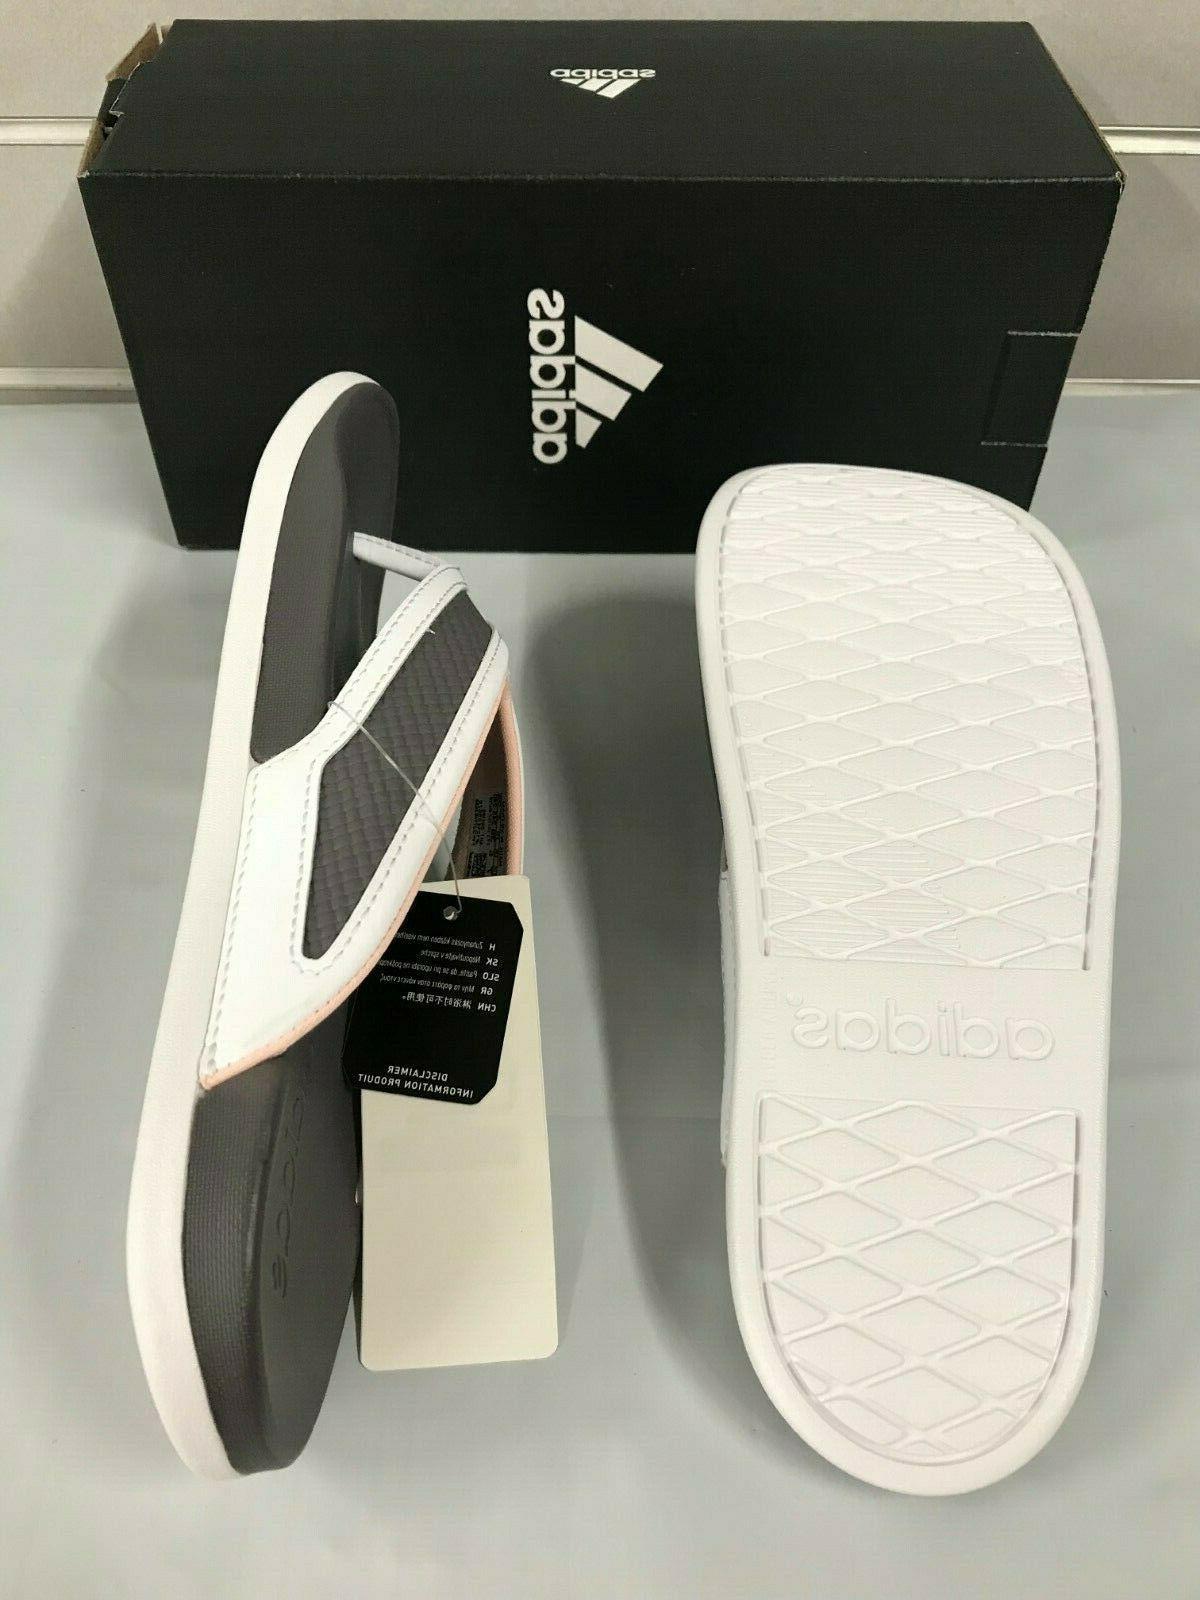 Adidas Flip Flops S81199 Sandals GREY/PINK NEW Sz 6-10